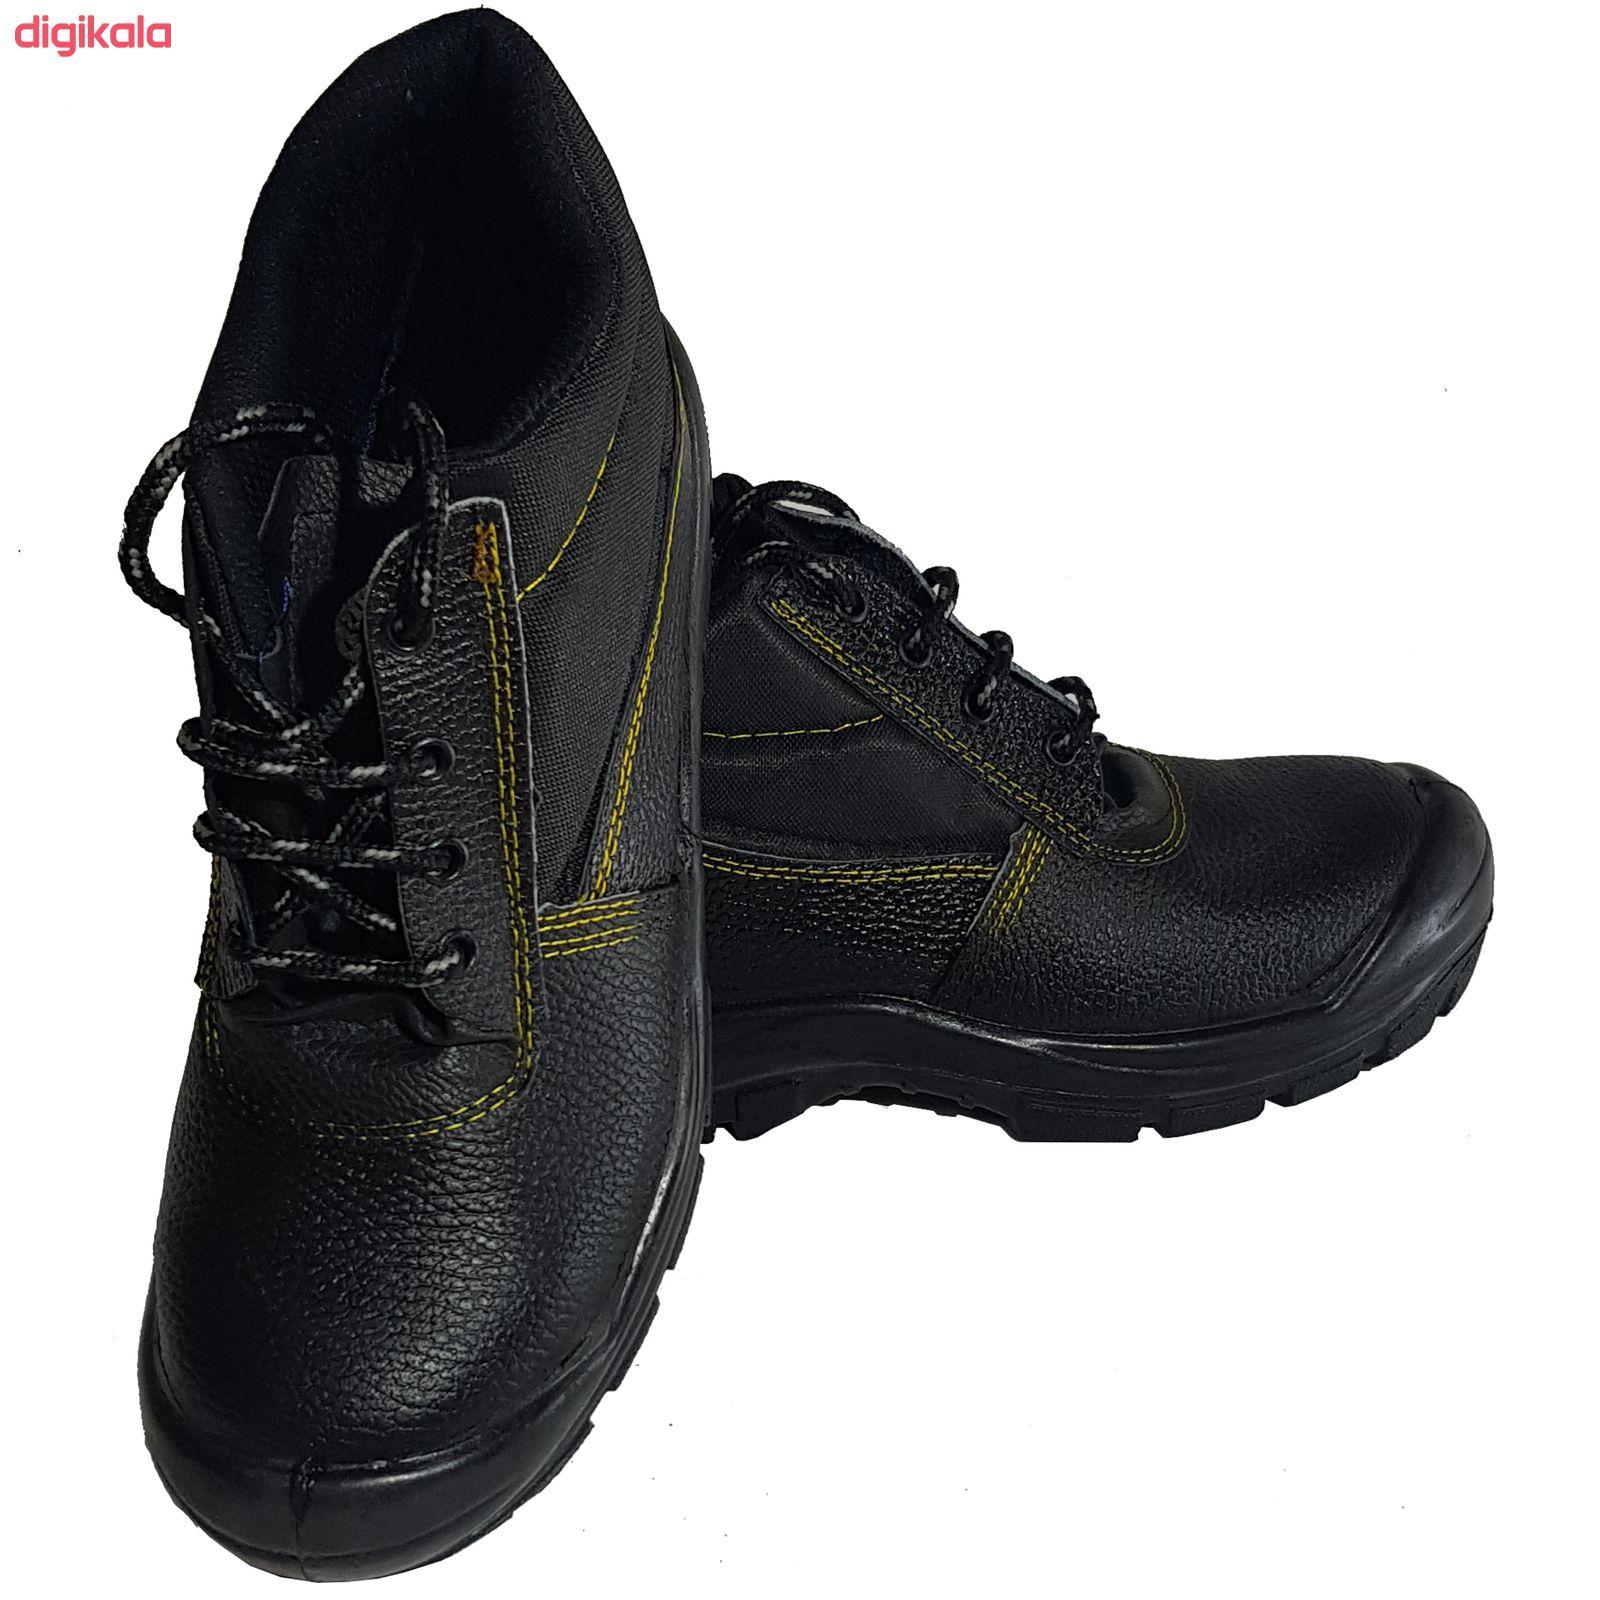 کفش کوهنوردی مردانه مدل یاشار کد YSHR222 main 1 3